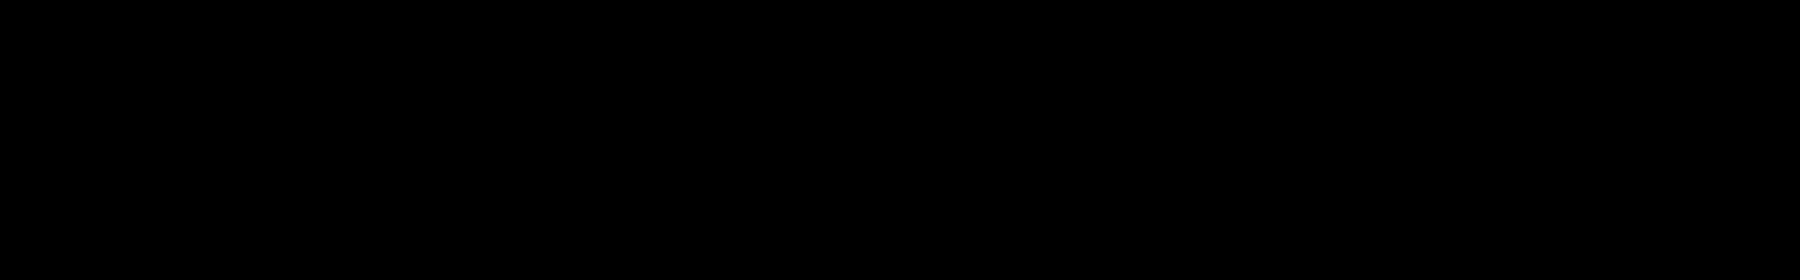 Zulu Psytrance audio waveform